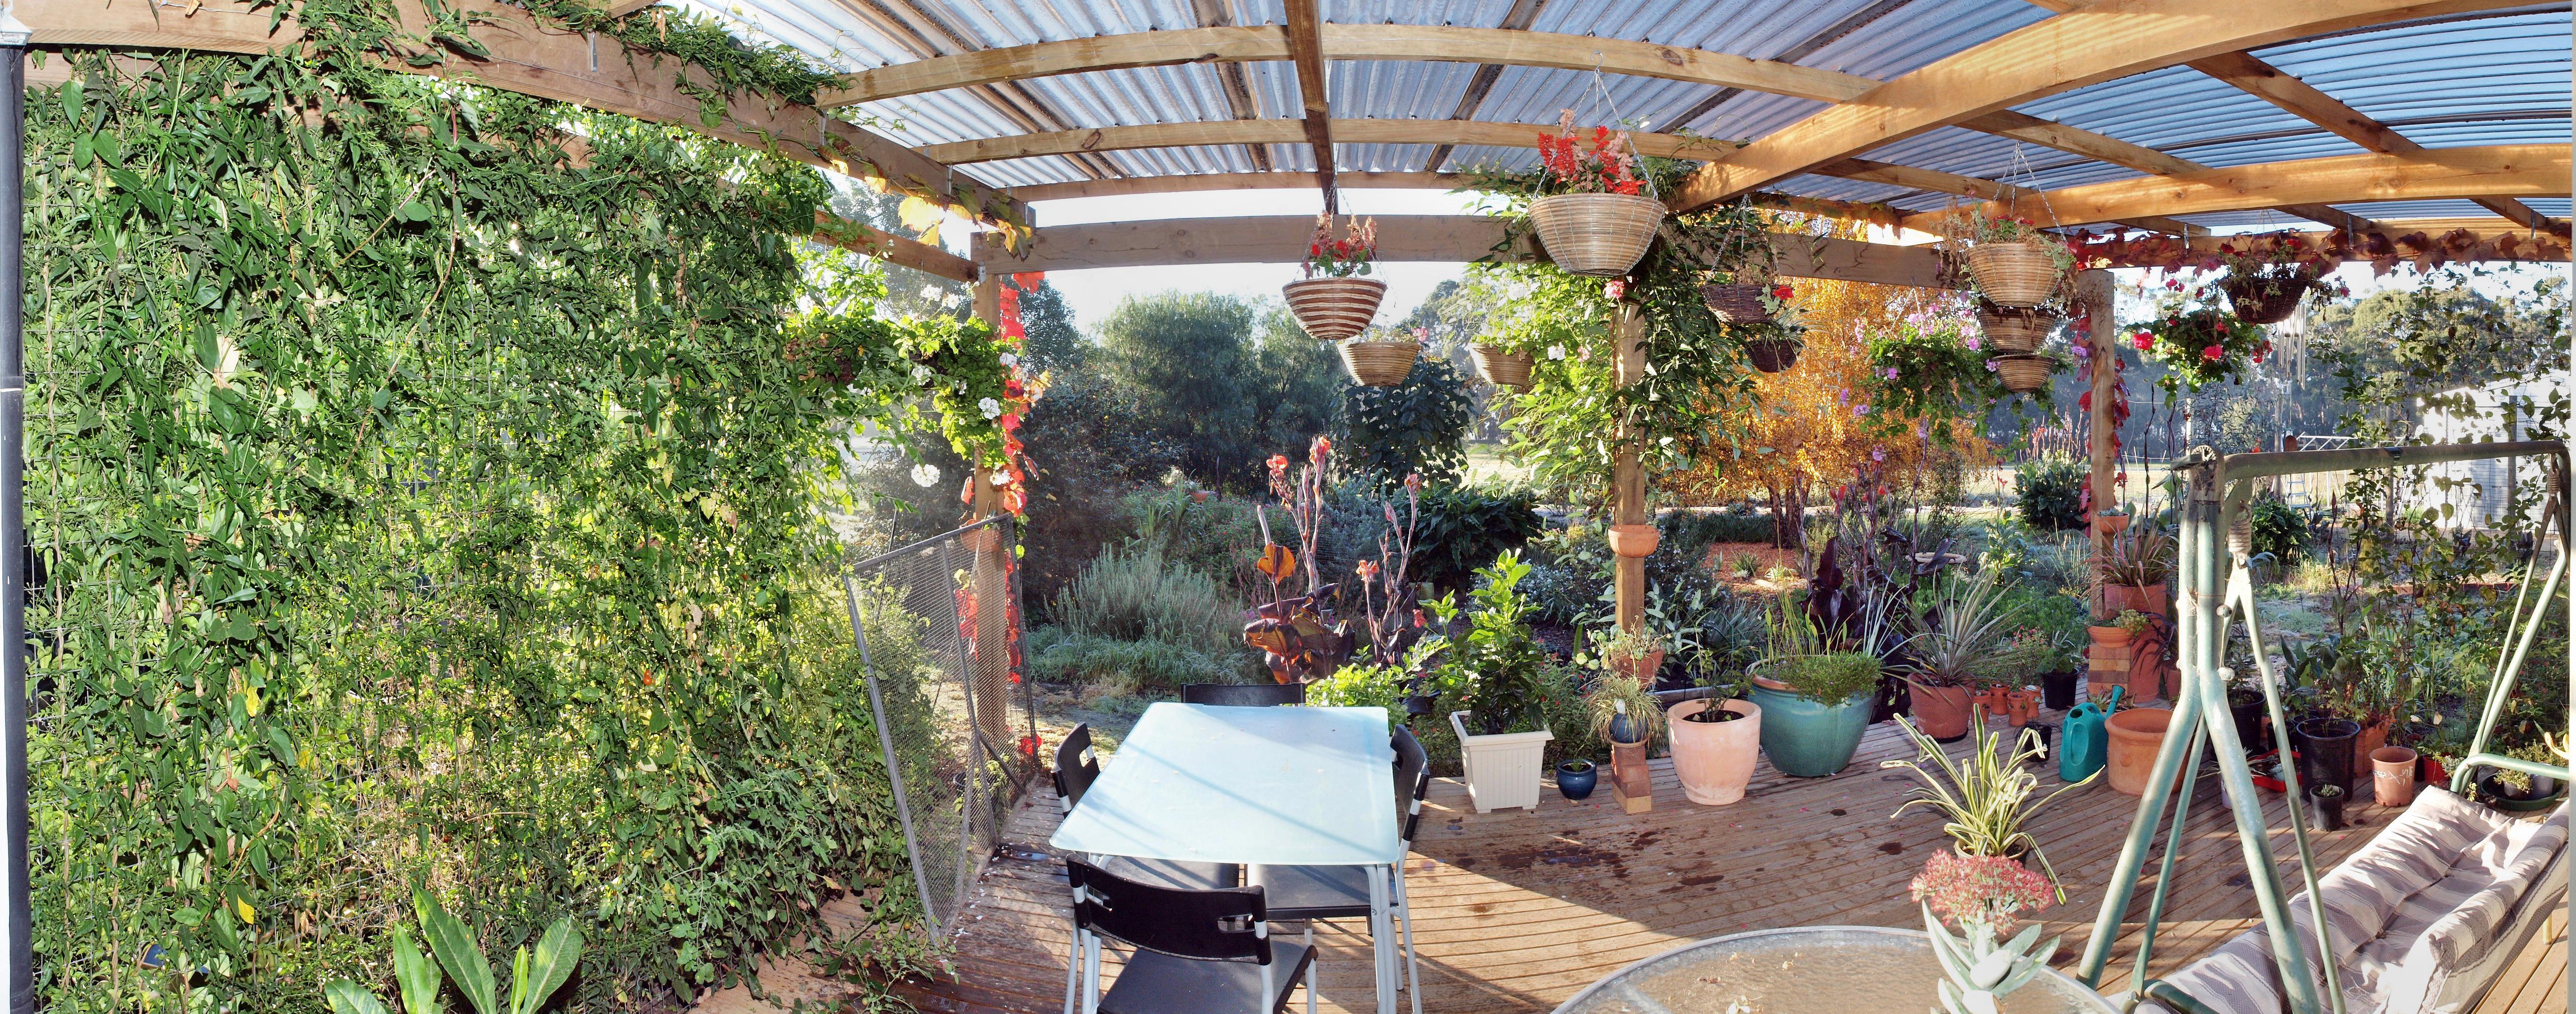 verandah-alt-panorama.jpeg